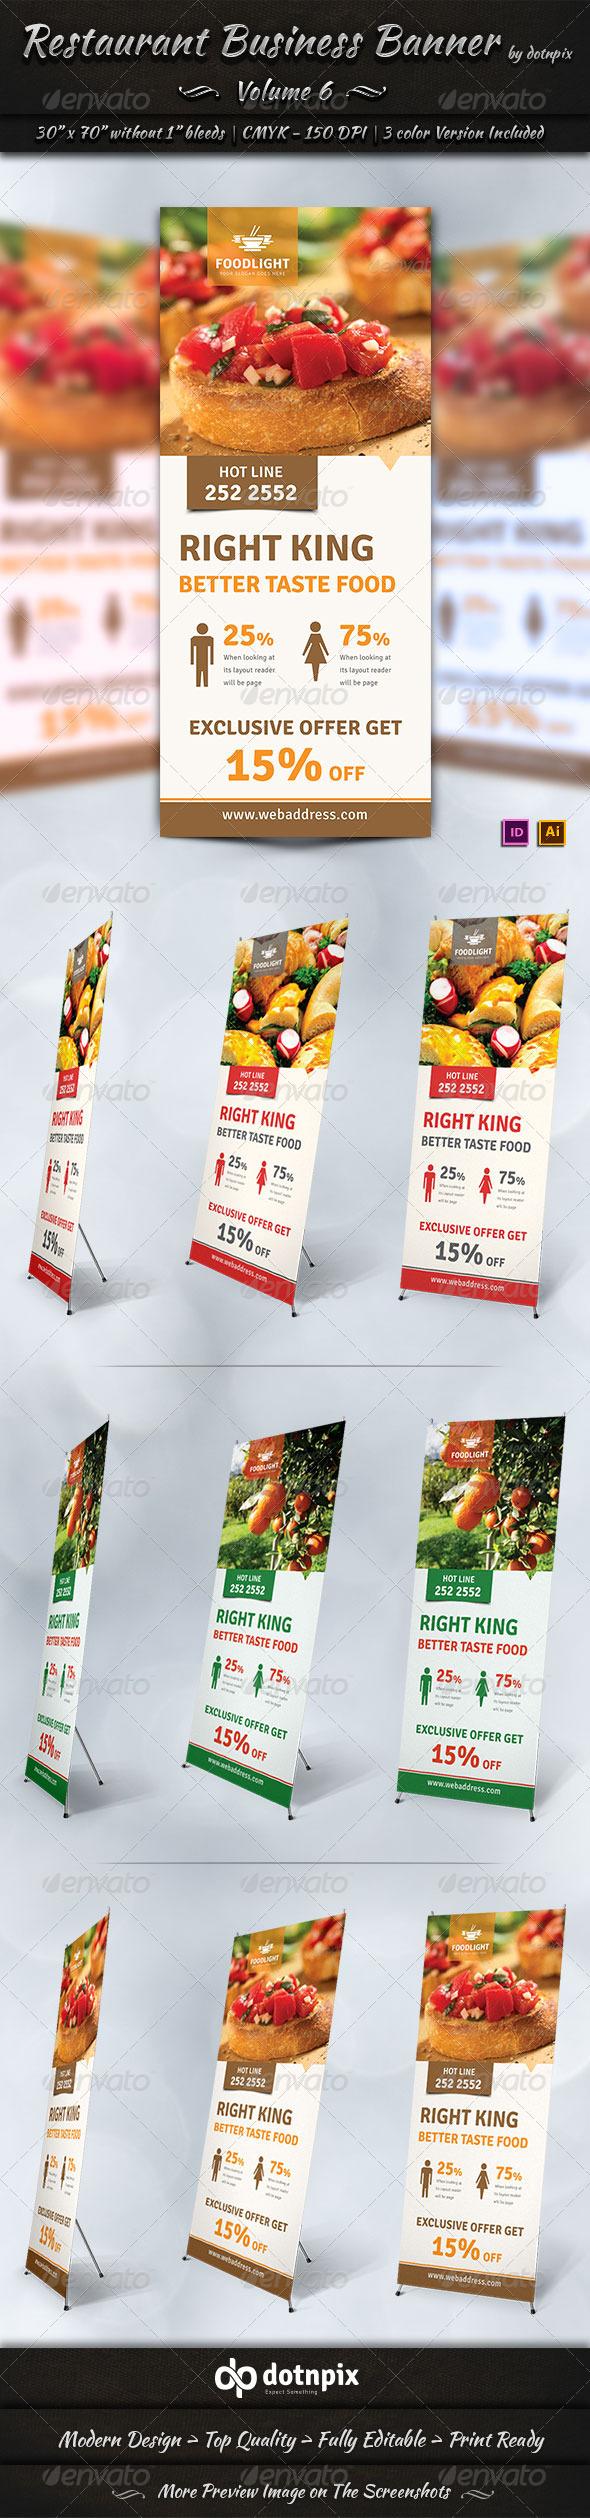 GraphicRiver Restaurant Business Banner Volume 6 7664911